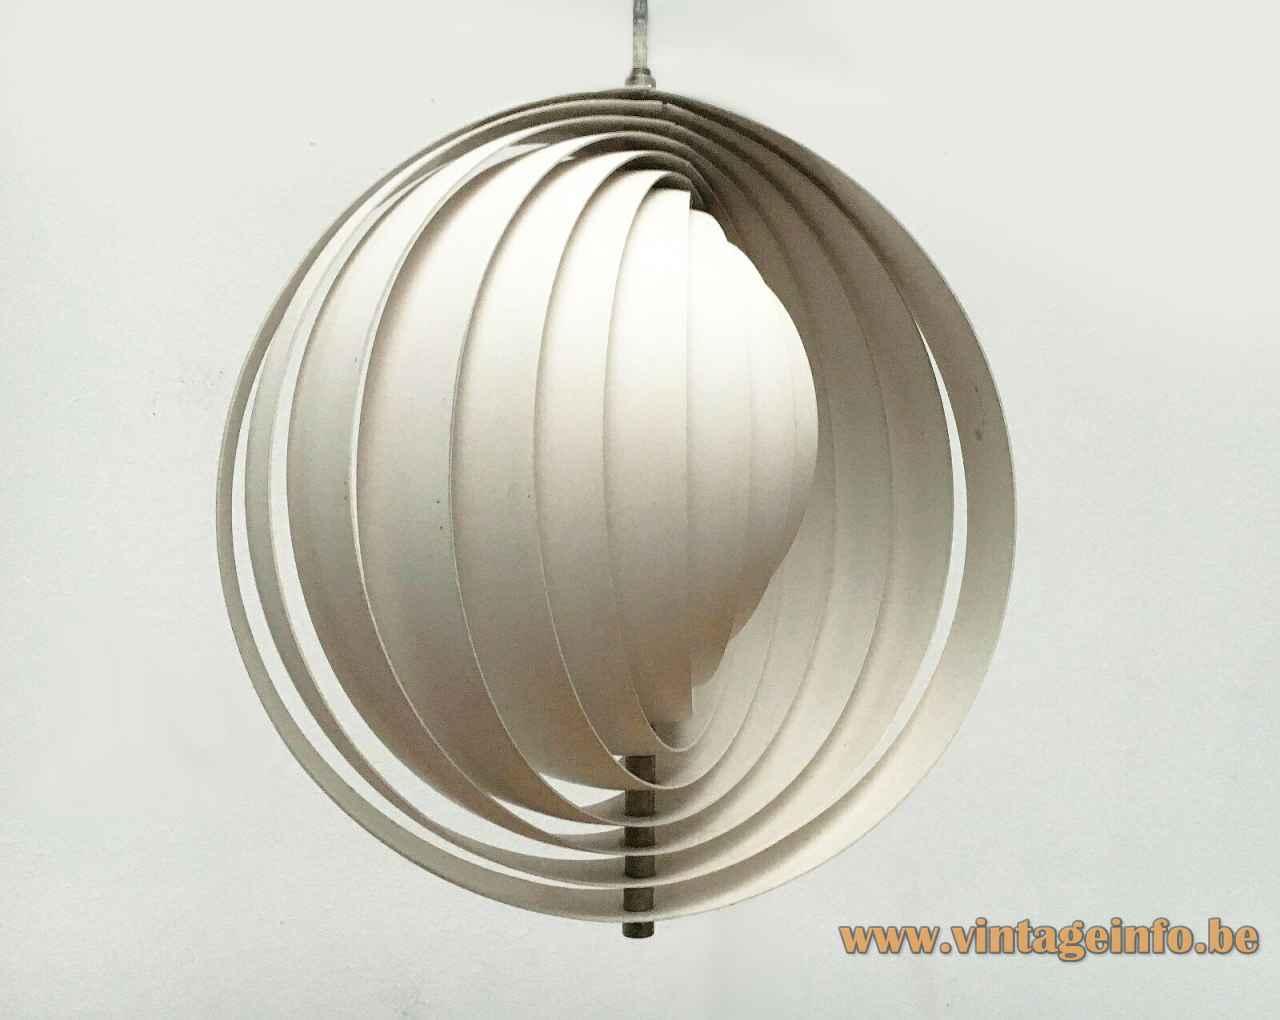 Verner Panton Moon pendant lamp adjustable 10 aluminium slats globe lampshade 1960 design Louis Poulsen Denmark